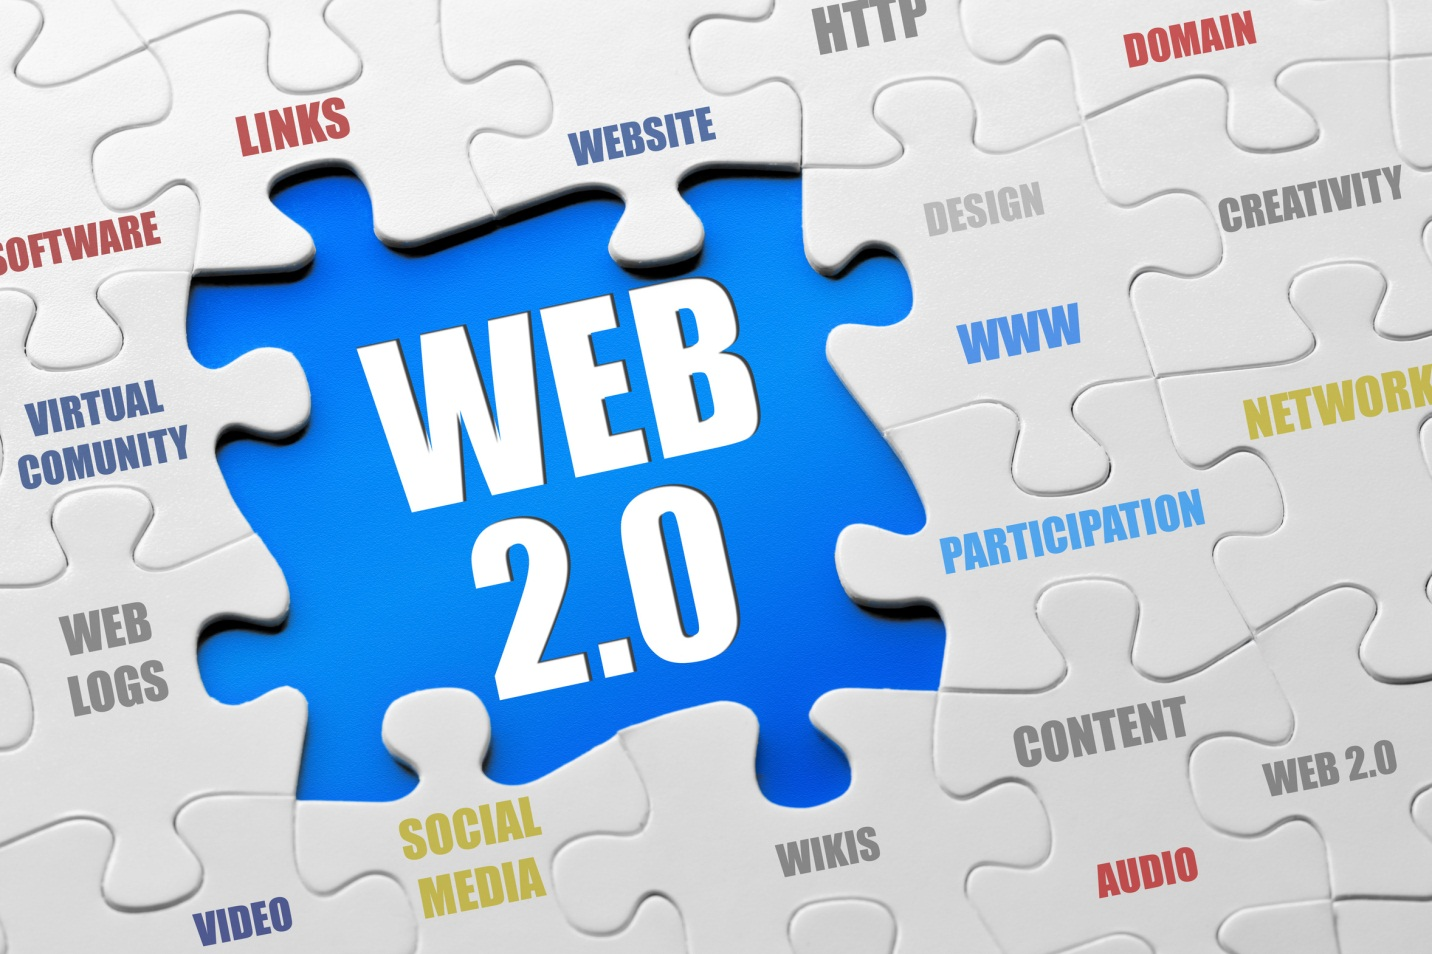 web 2.0 for backlinks